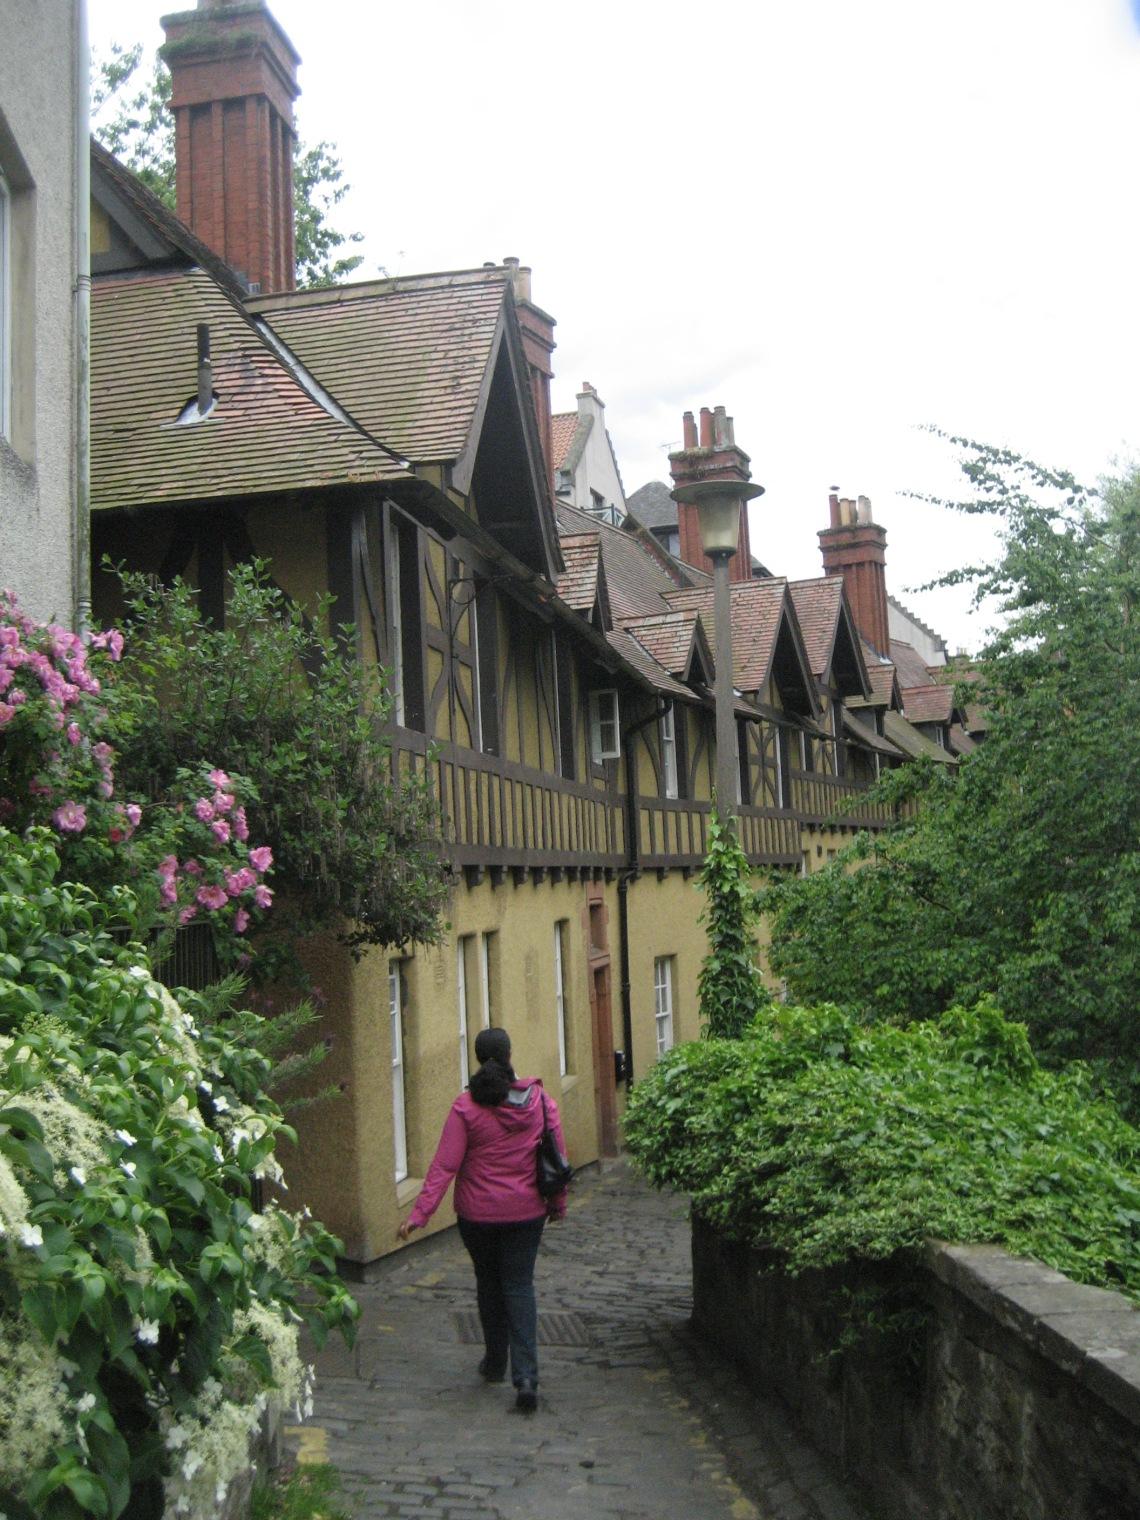 Ivia in Wonderland or Deen Village